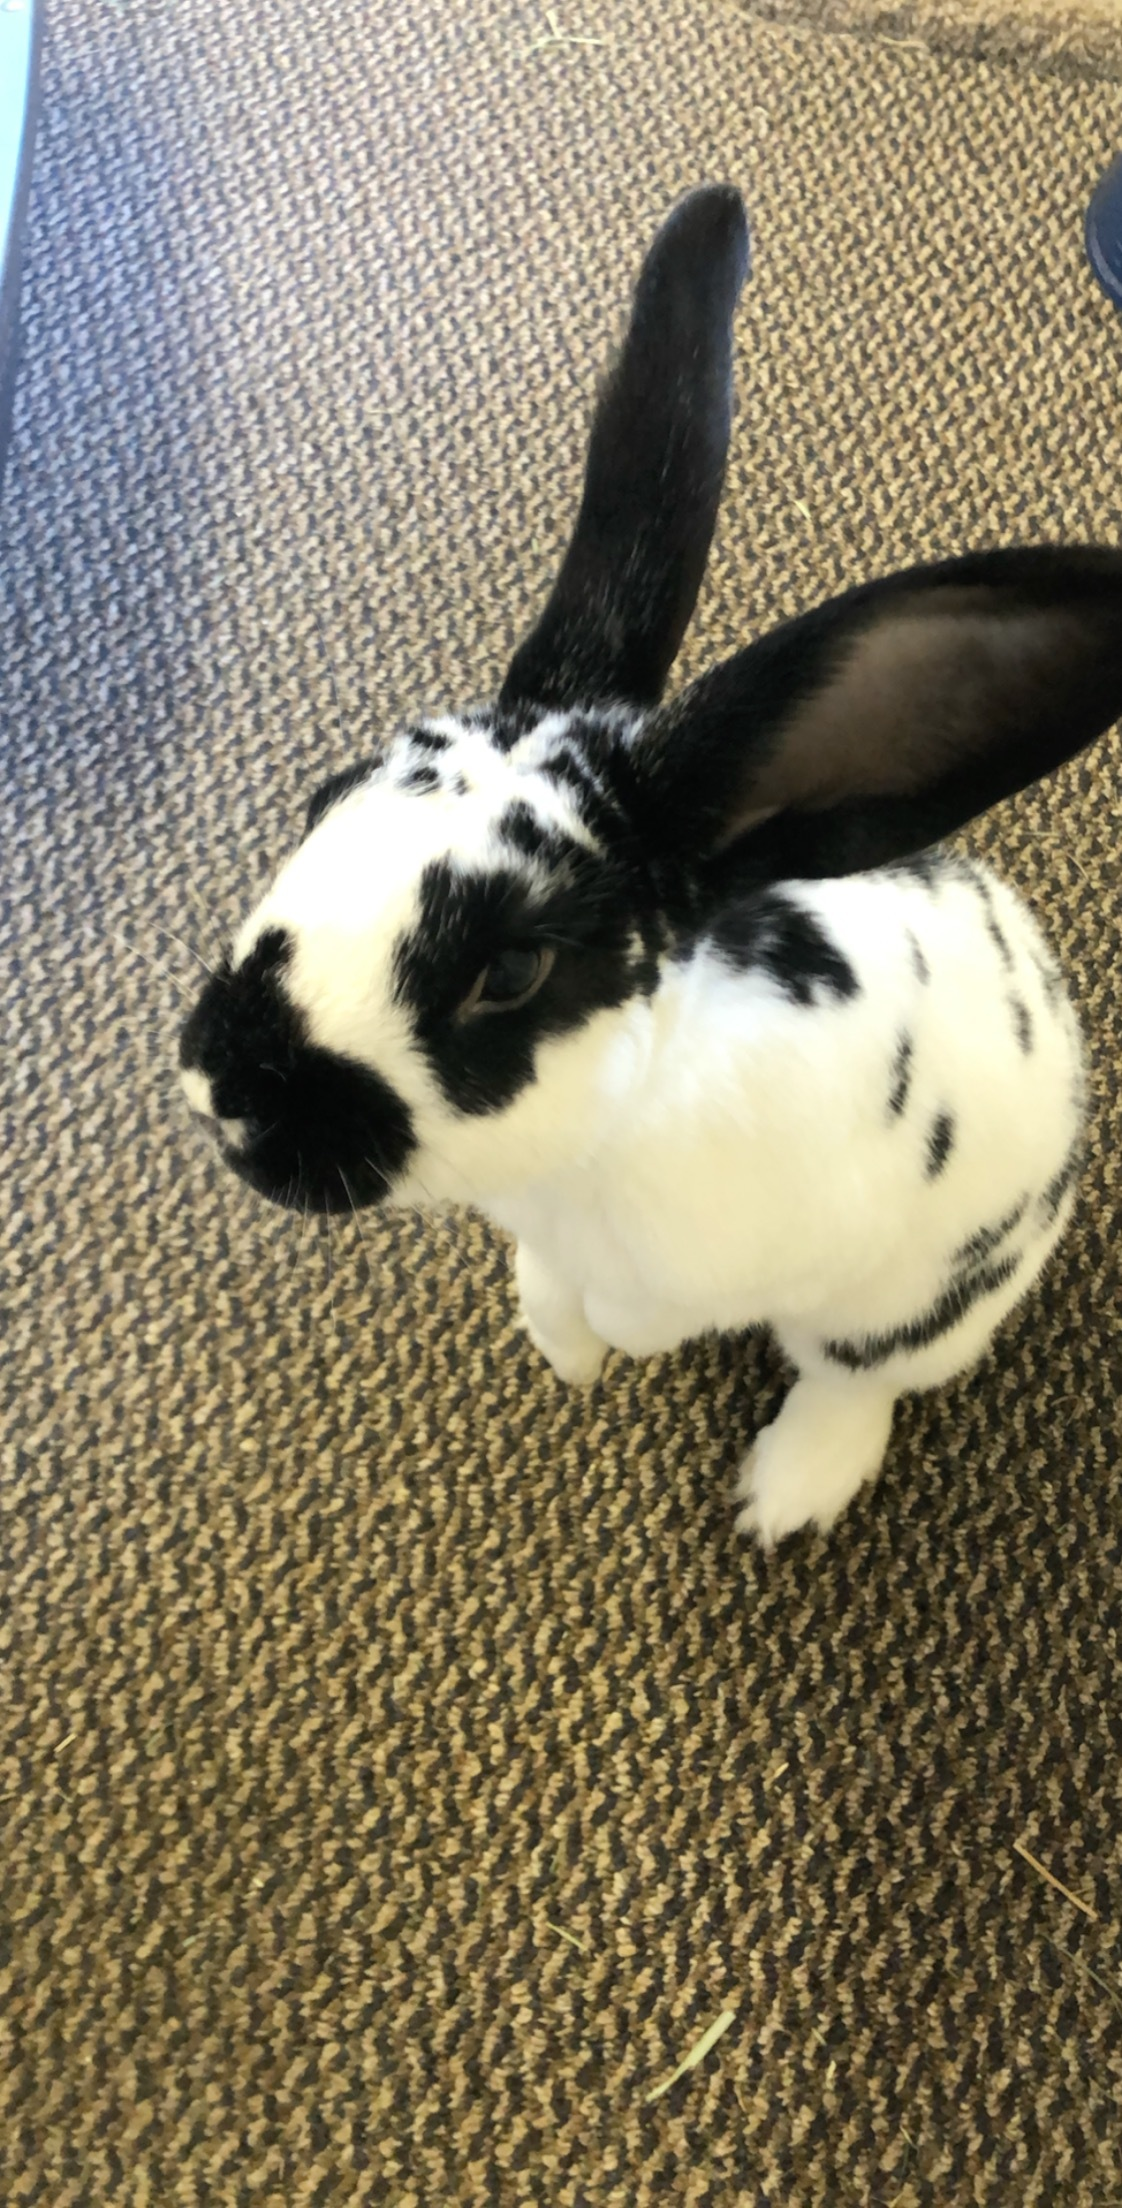 Real Bunnies For Sale Near Me : bunnies, Rabbits, Adoption, Philadelphia,, Petfinder